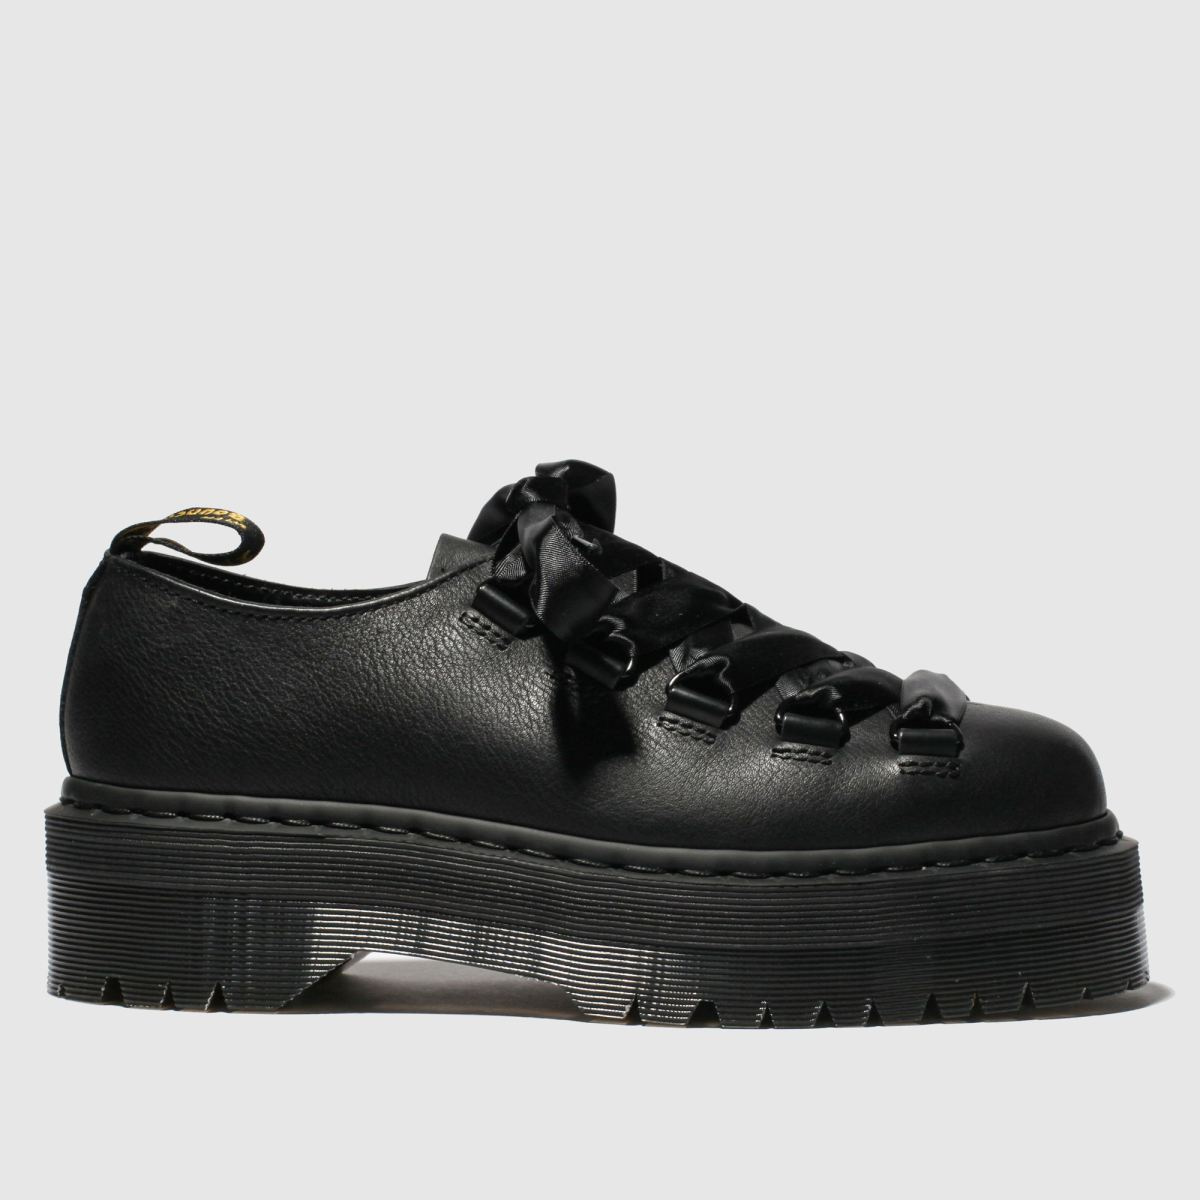 Dr Martens Black Caraya Shoe Flat Shoes